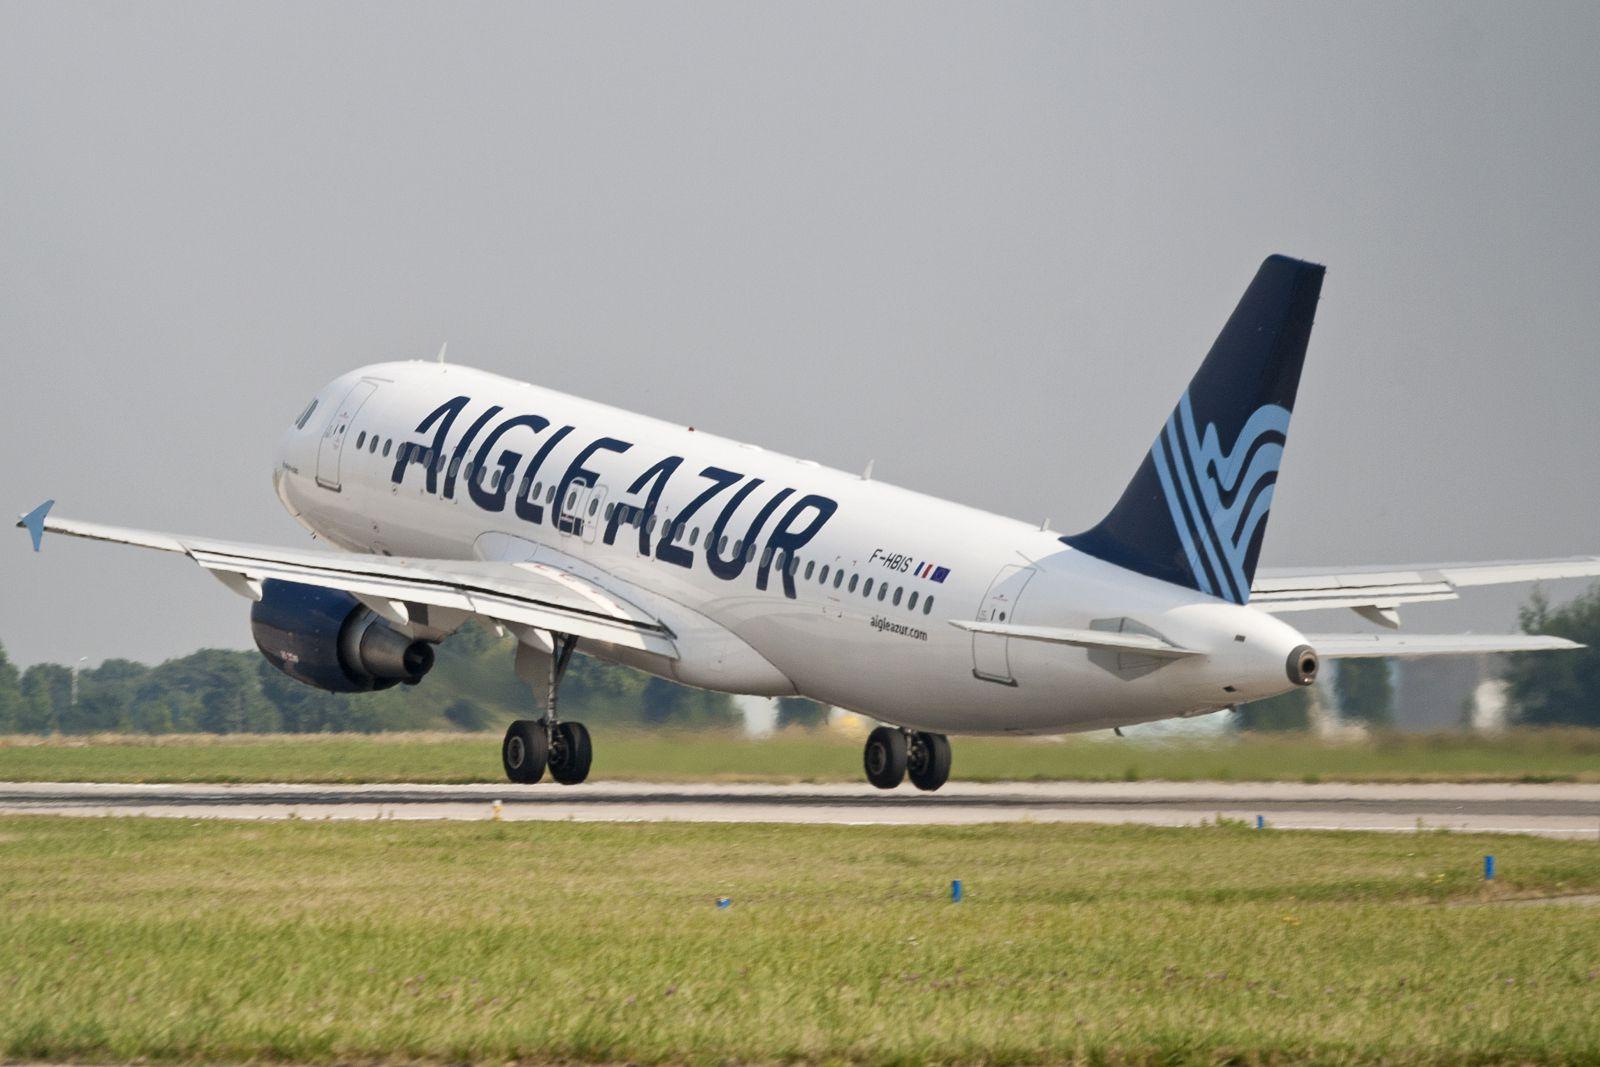 [Image: Aigle-Azur-A320-F-HBIS.jpg?fit=1600%2C1067&ssl=1]